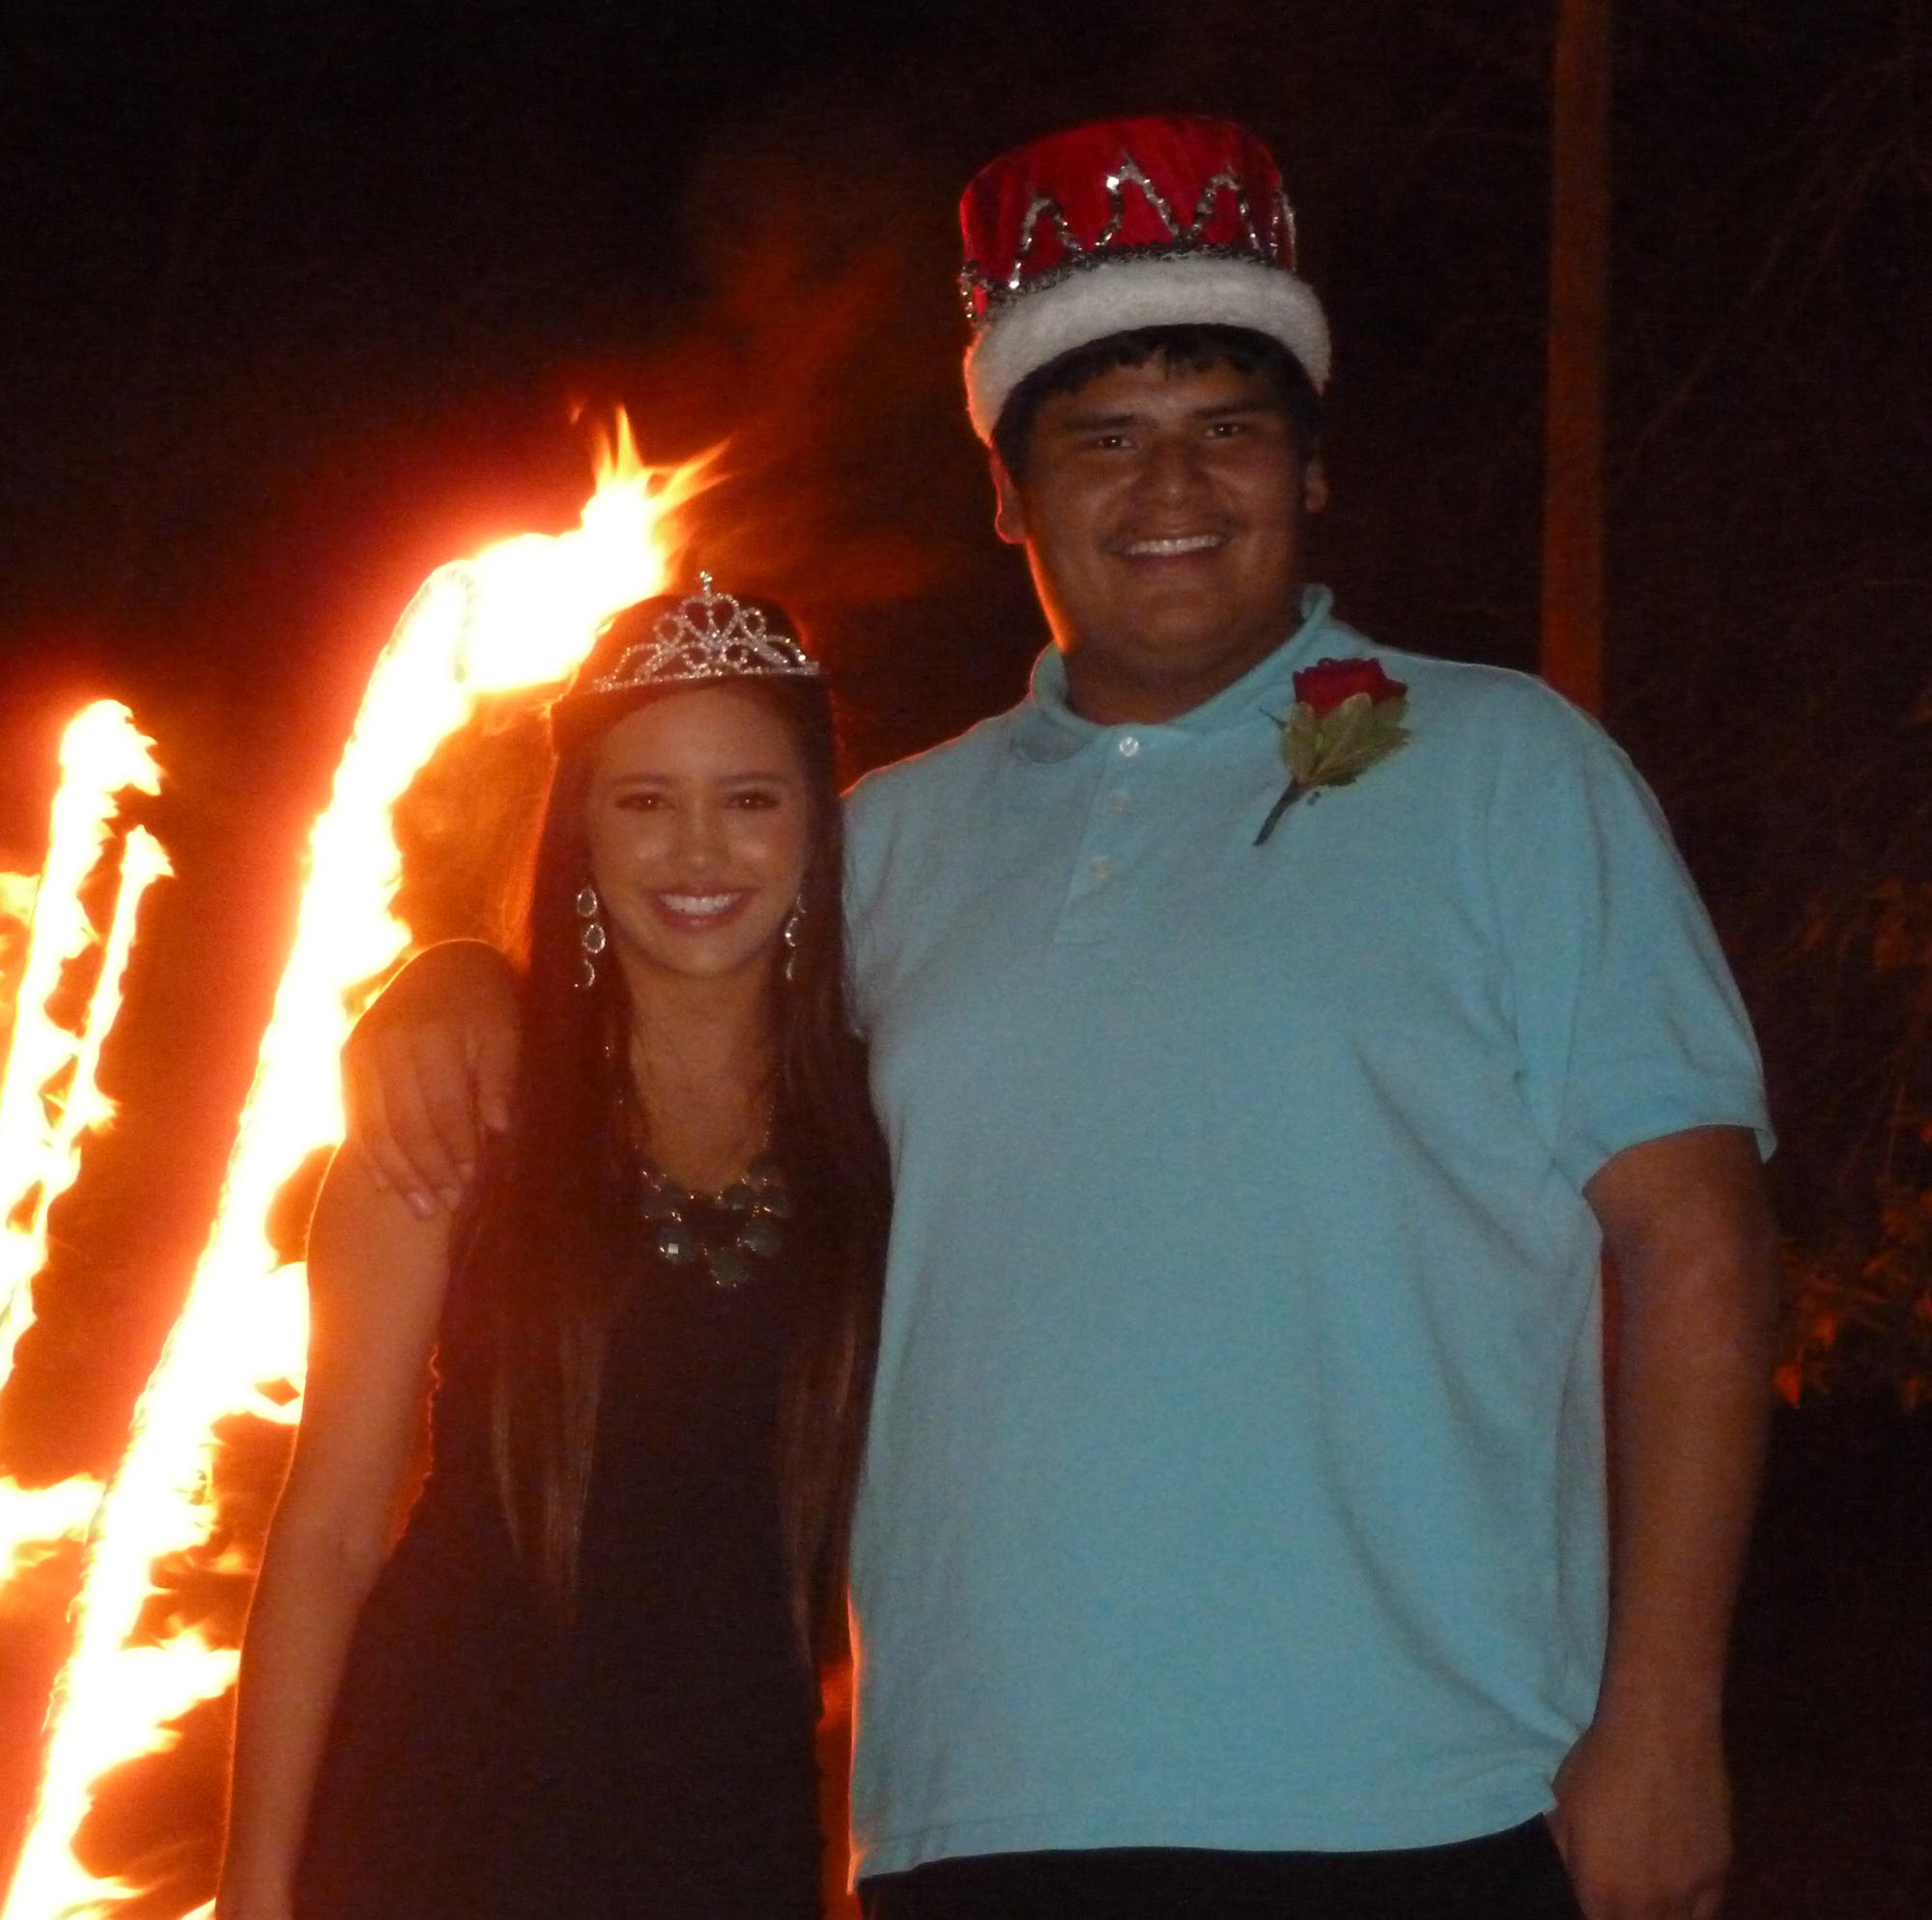 St. Joseph's high school student Cody is the Chamberlain High School Homecoming King for 2013.